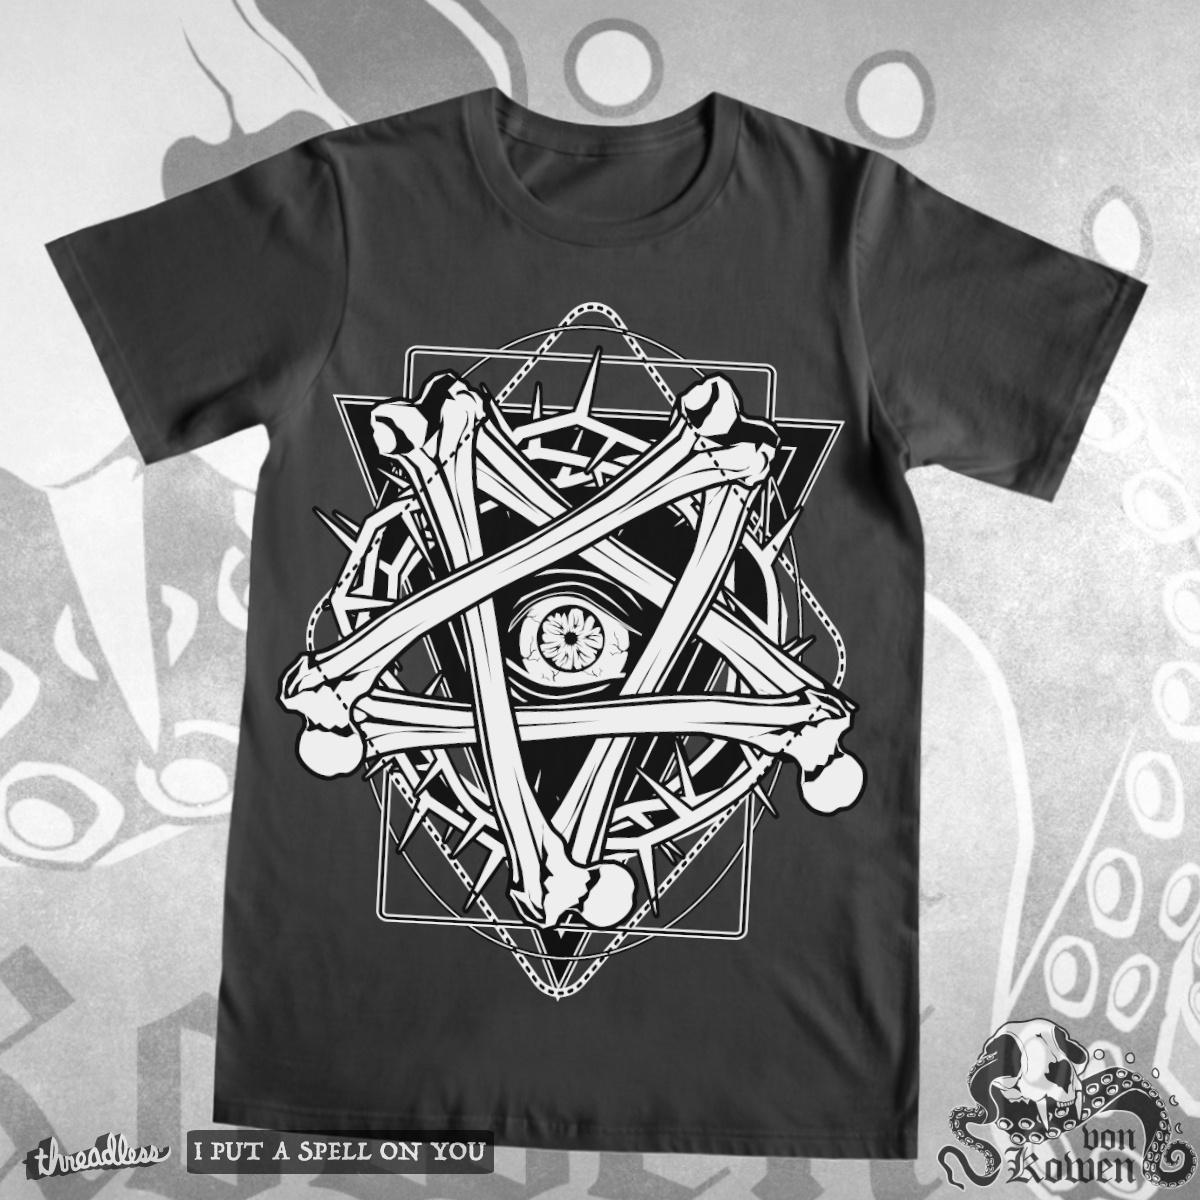 Bonetagram, a cool t-shirt design